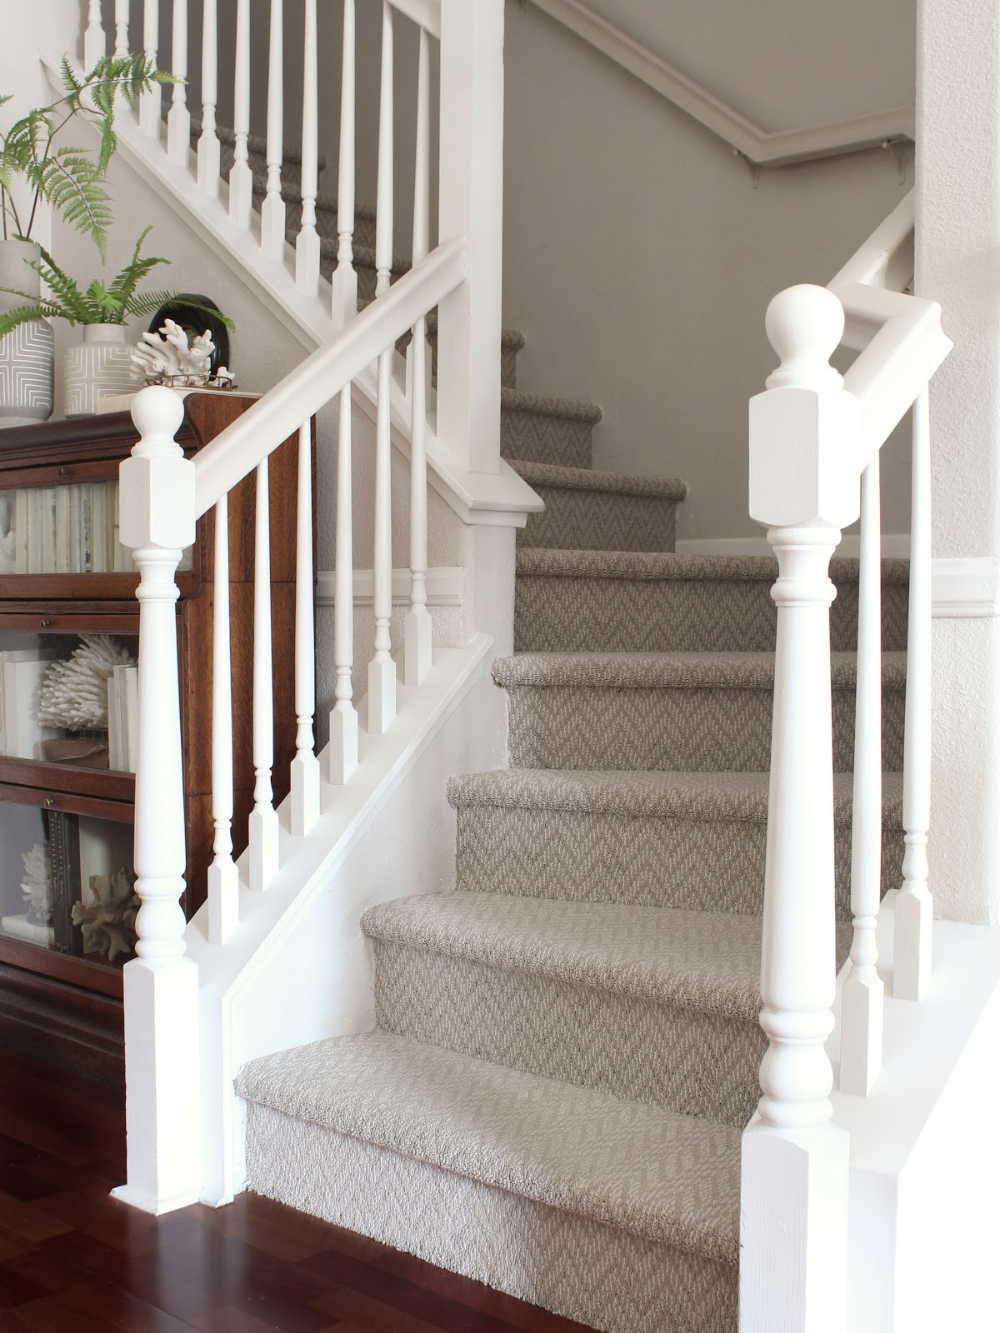 Herringbone Carpet In 2020 Patterned Stair Carpet New Carpet Carpet Stairs